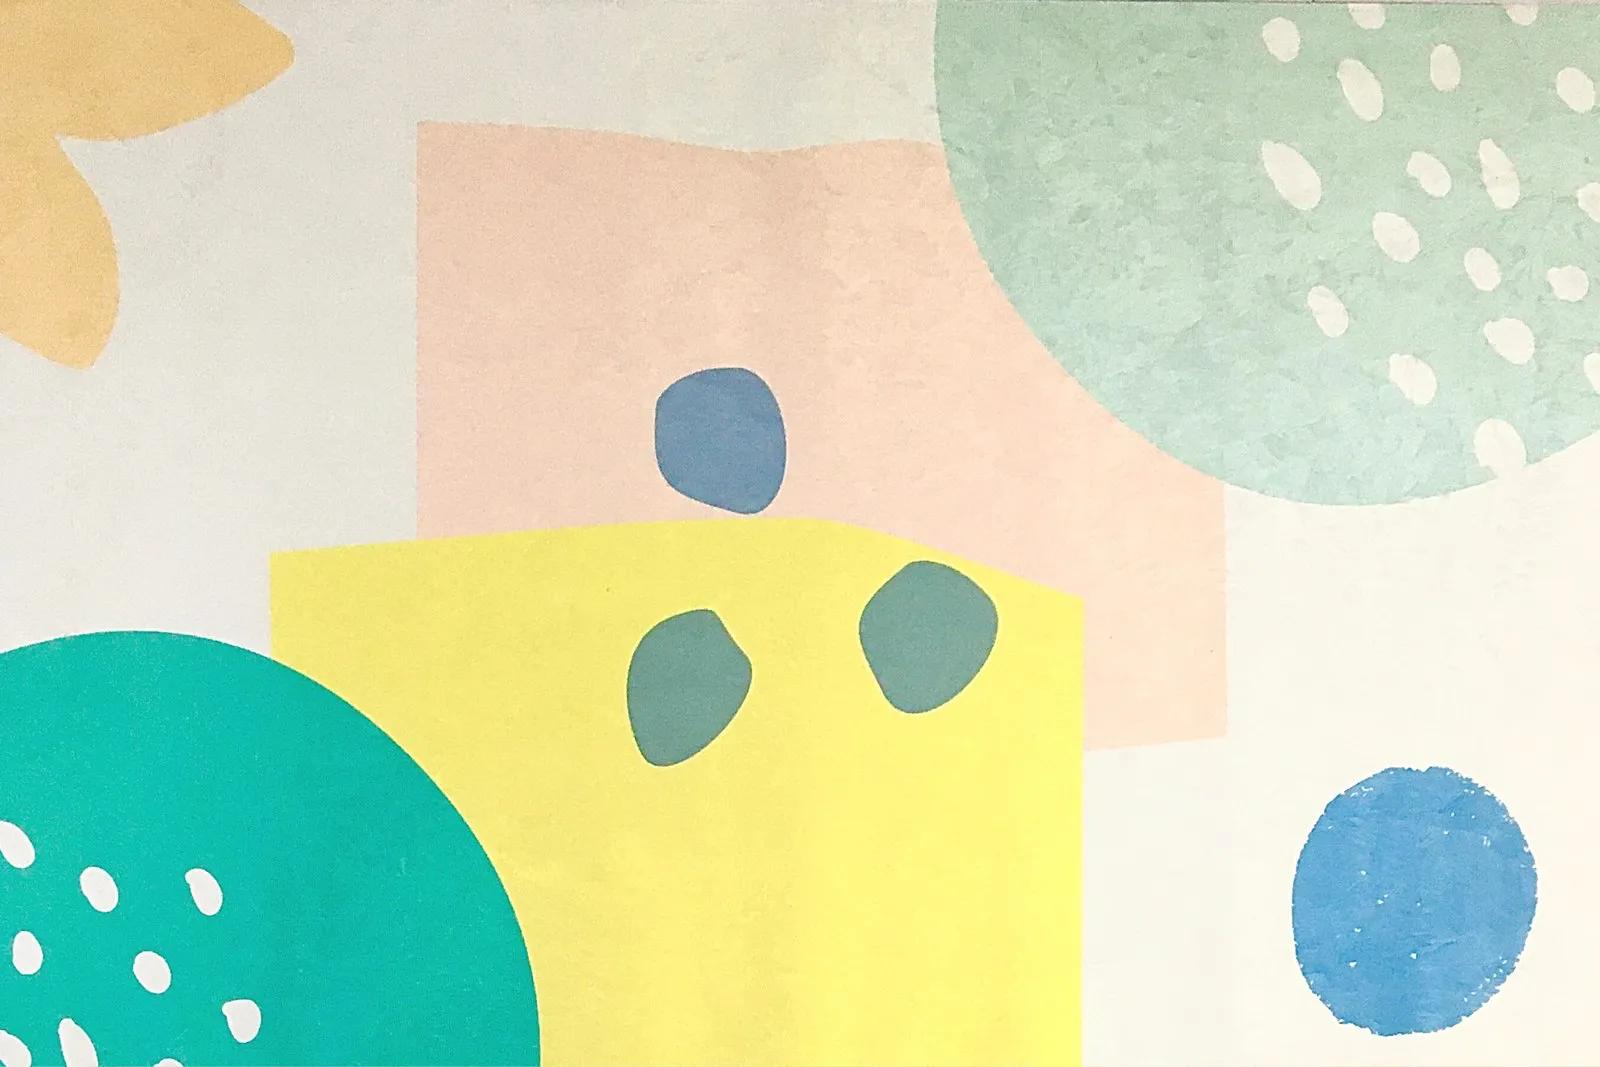 Tapete quarto infantil 100 x 150 cm estampa Natureza  - Pomelo Decor